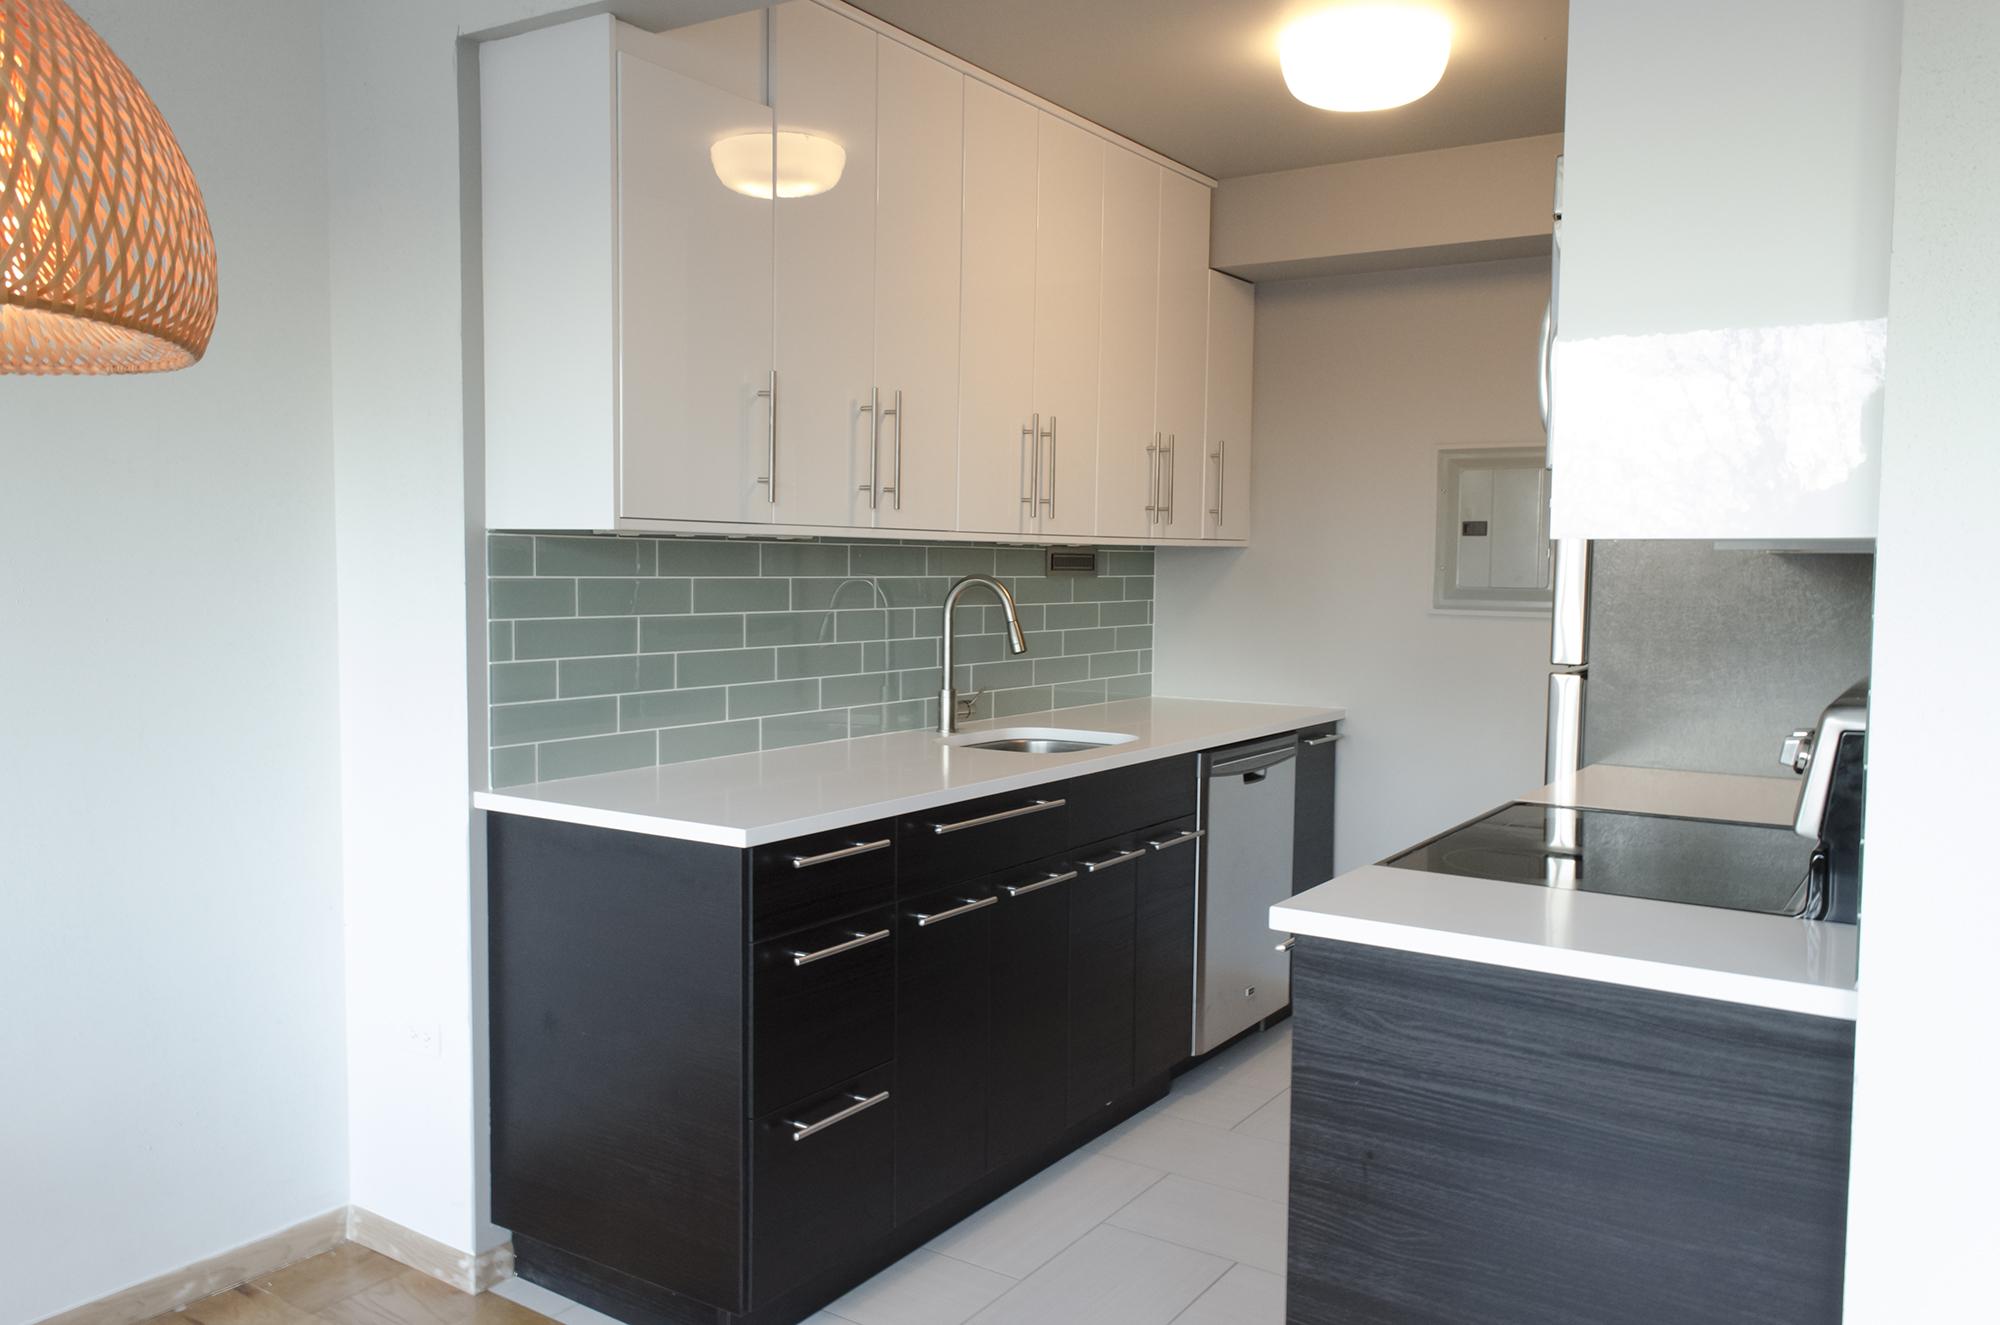 Small appliances for kitchen Photo - 10